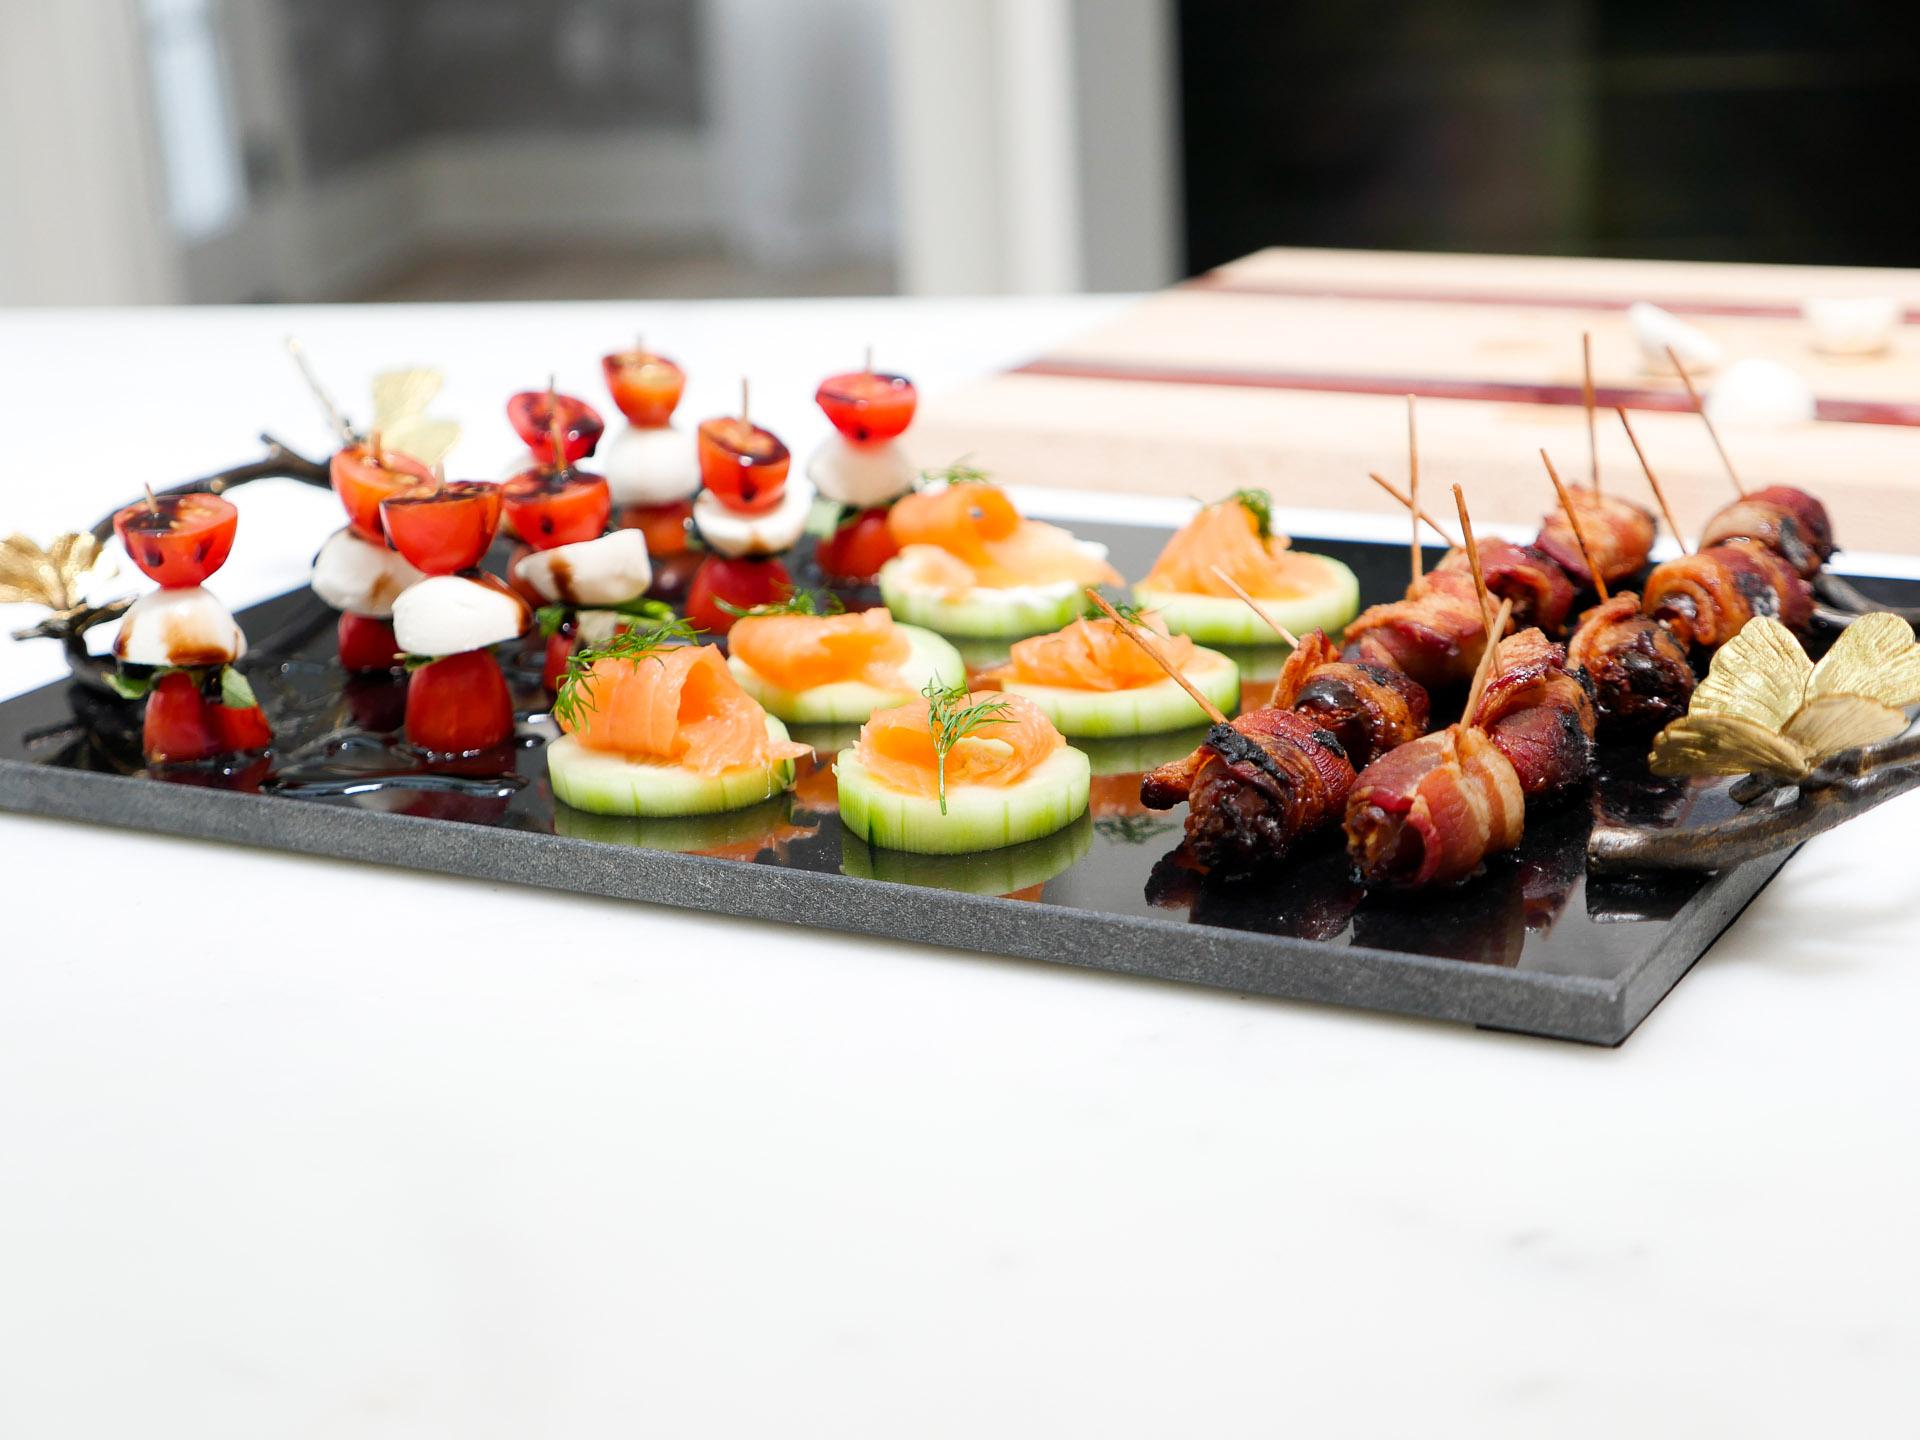 Eva Amurri shares 3 Easy Hors D'Oeuvres